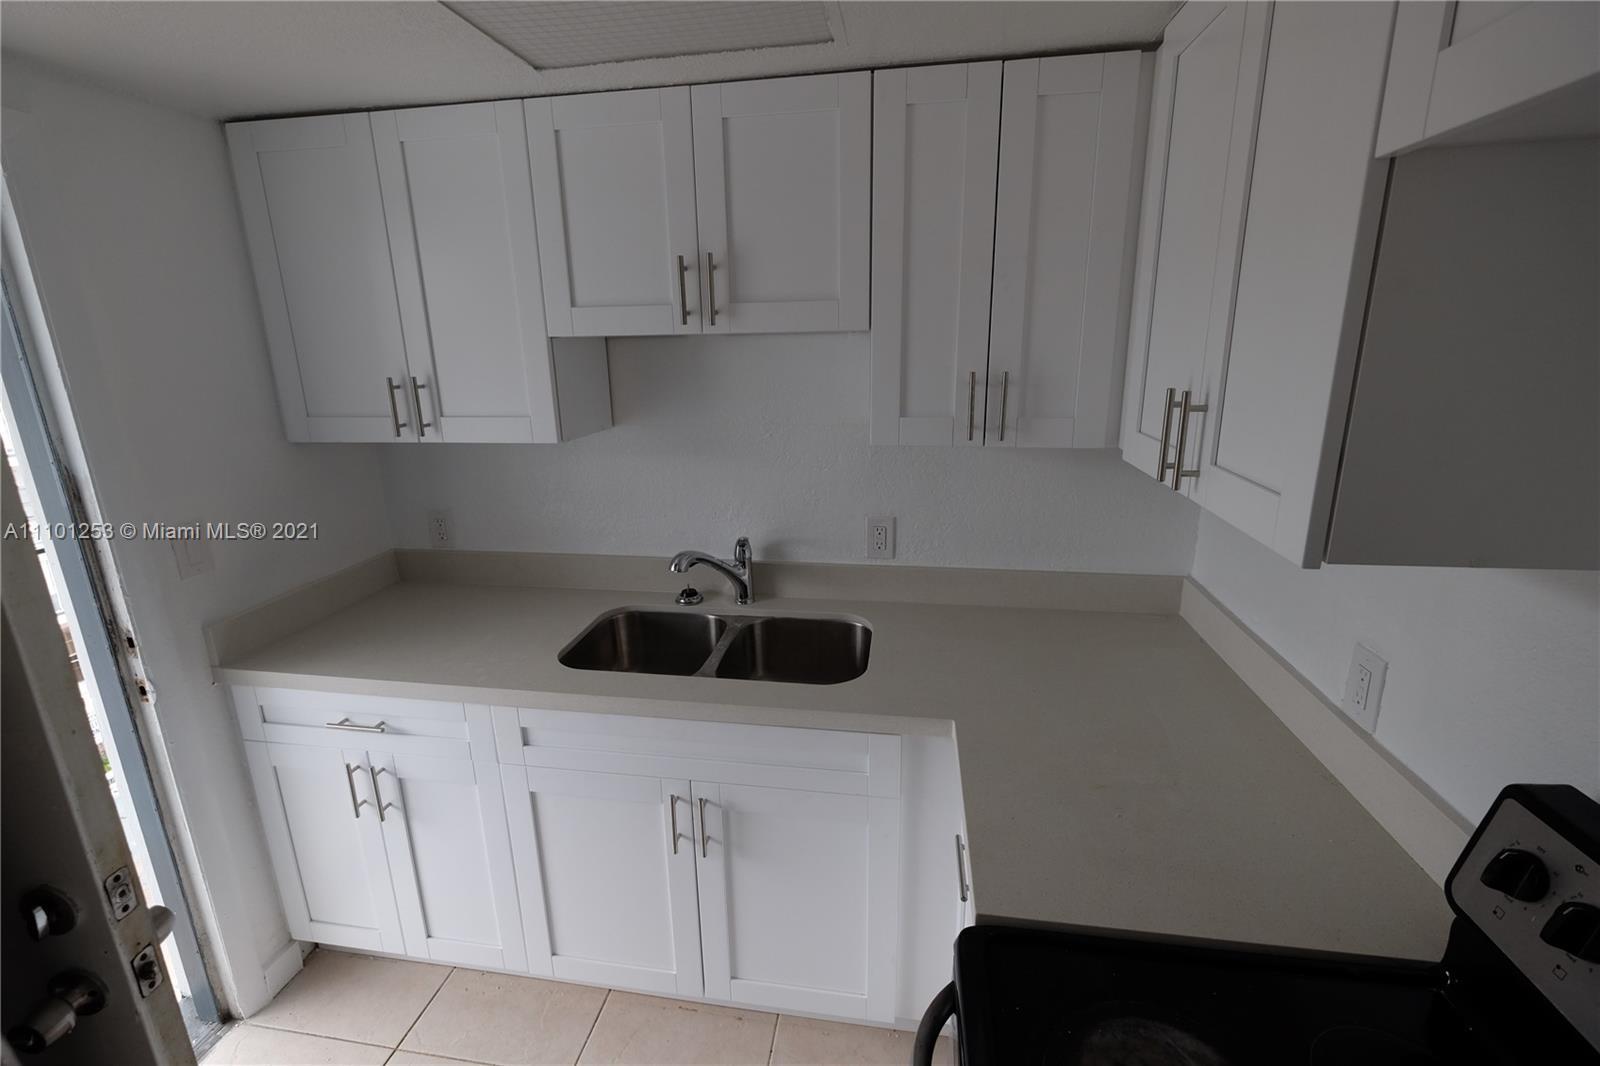 THE WHITE HOUSE CONDO Condo,For Rent,THE WHITE HOUSE CONDO Brickell,realty,broker,condos near me